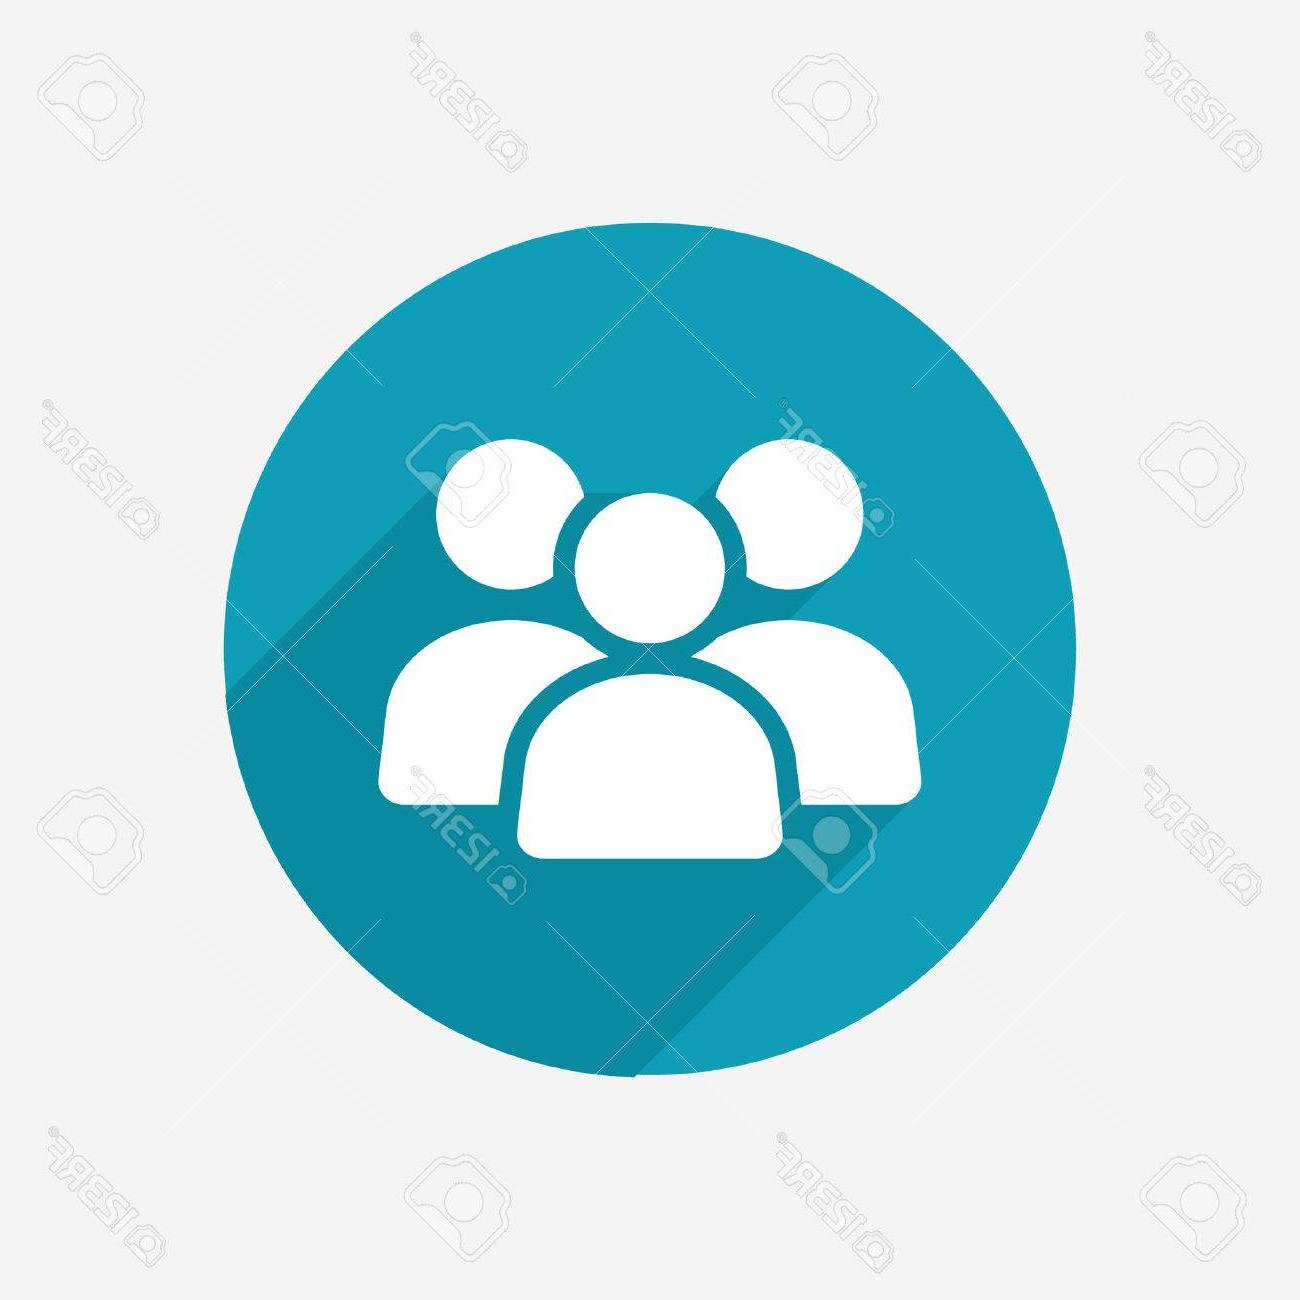 Teamwork vector clipart vector free download Best HD Teamwork Vector Icon Library » Free Vector Art ... vector free download